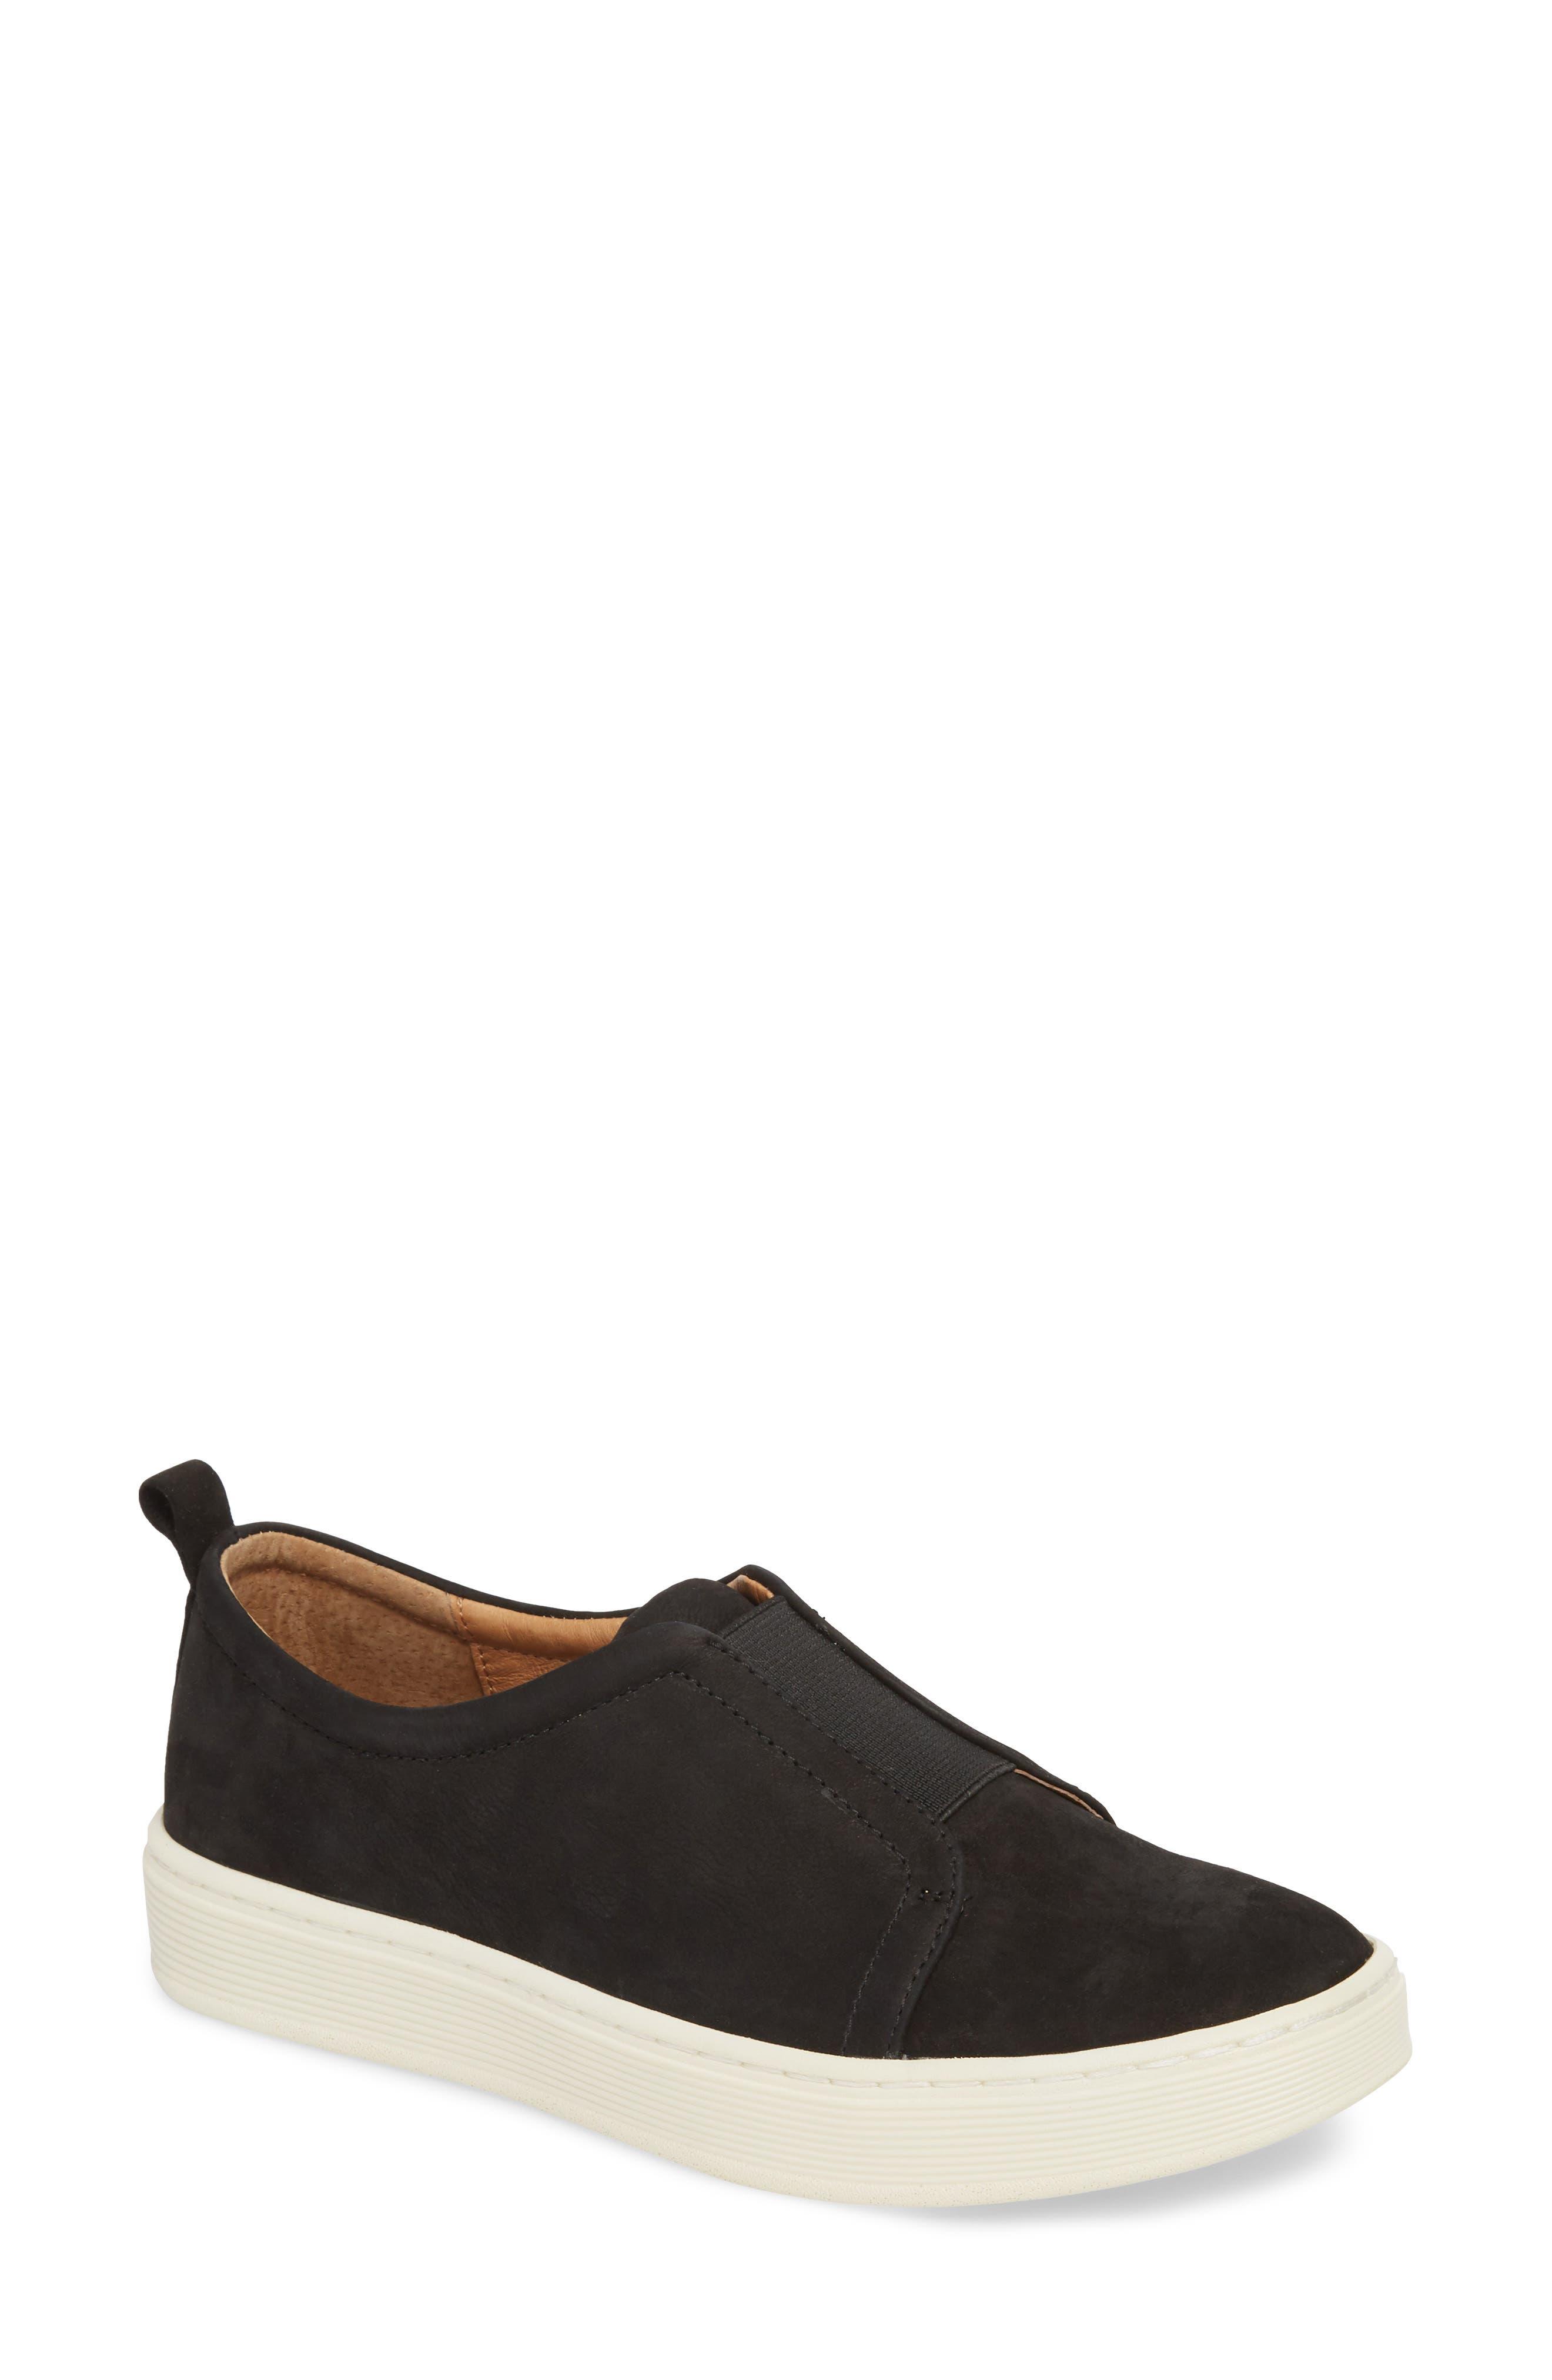 Safia Slip-On Sneaker,                         Main,                         color, TRUE BLACK LEATHER